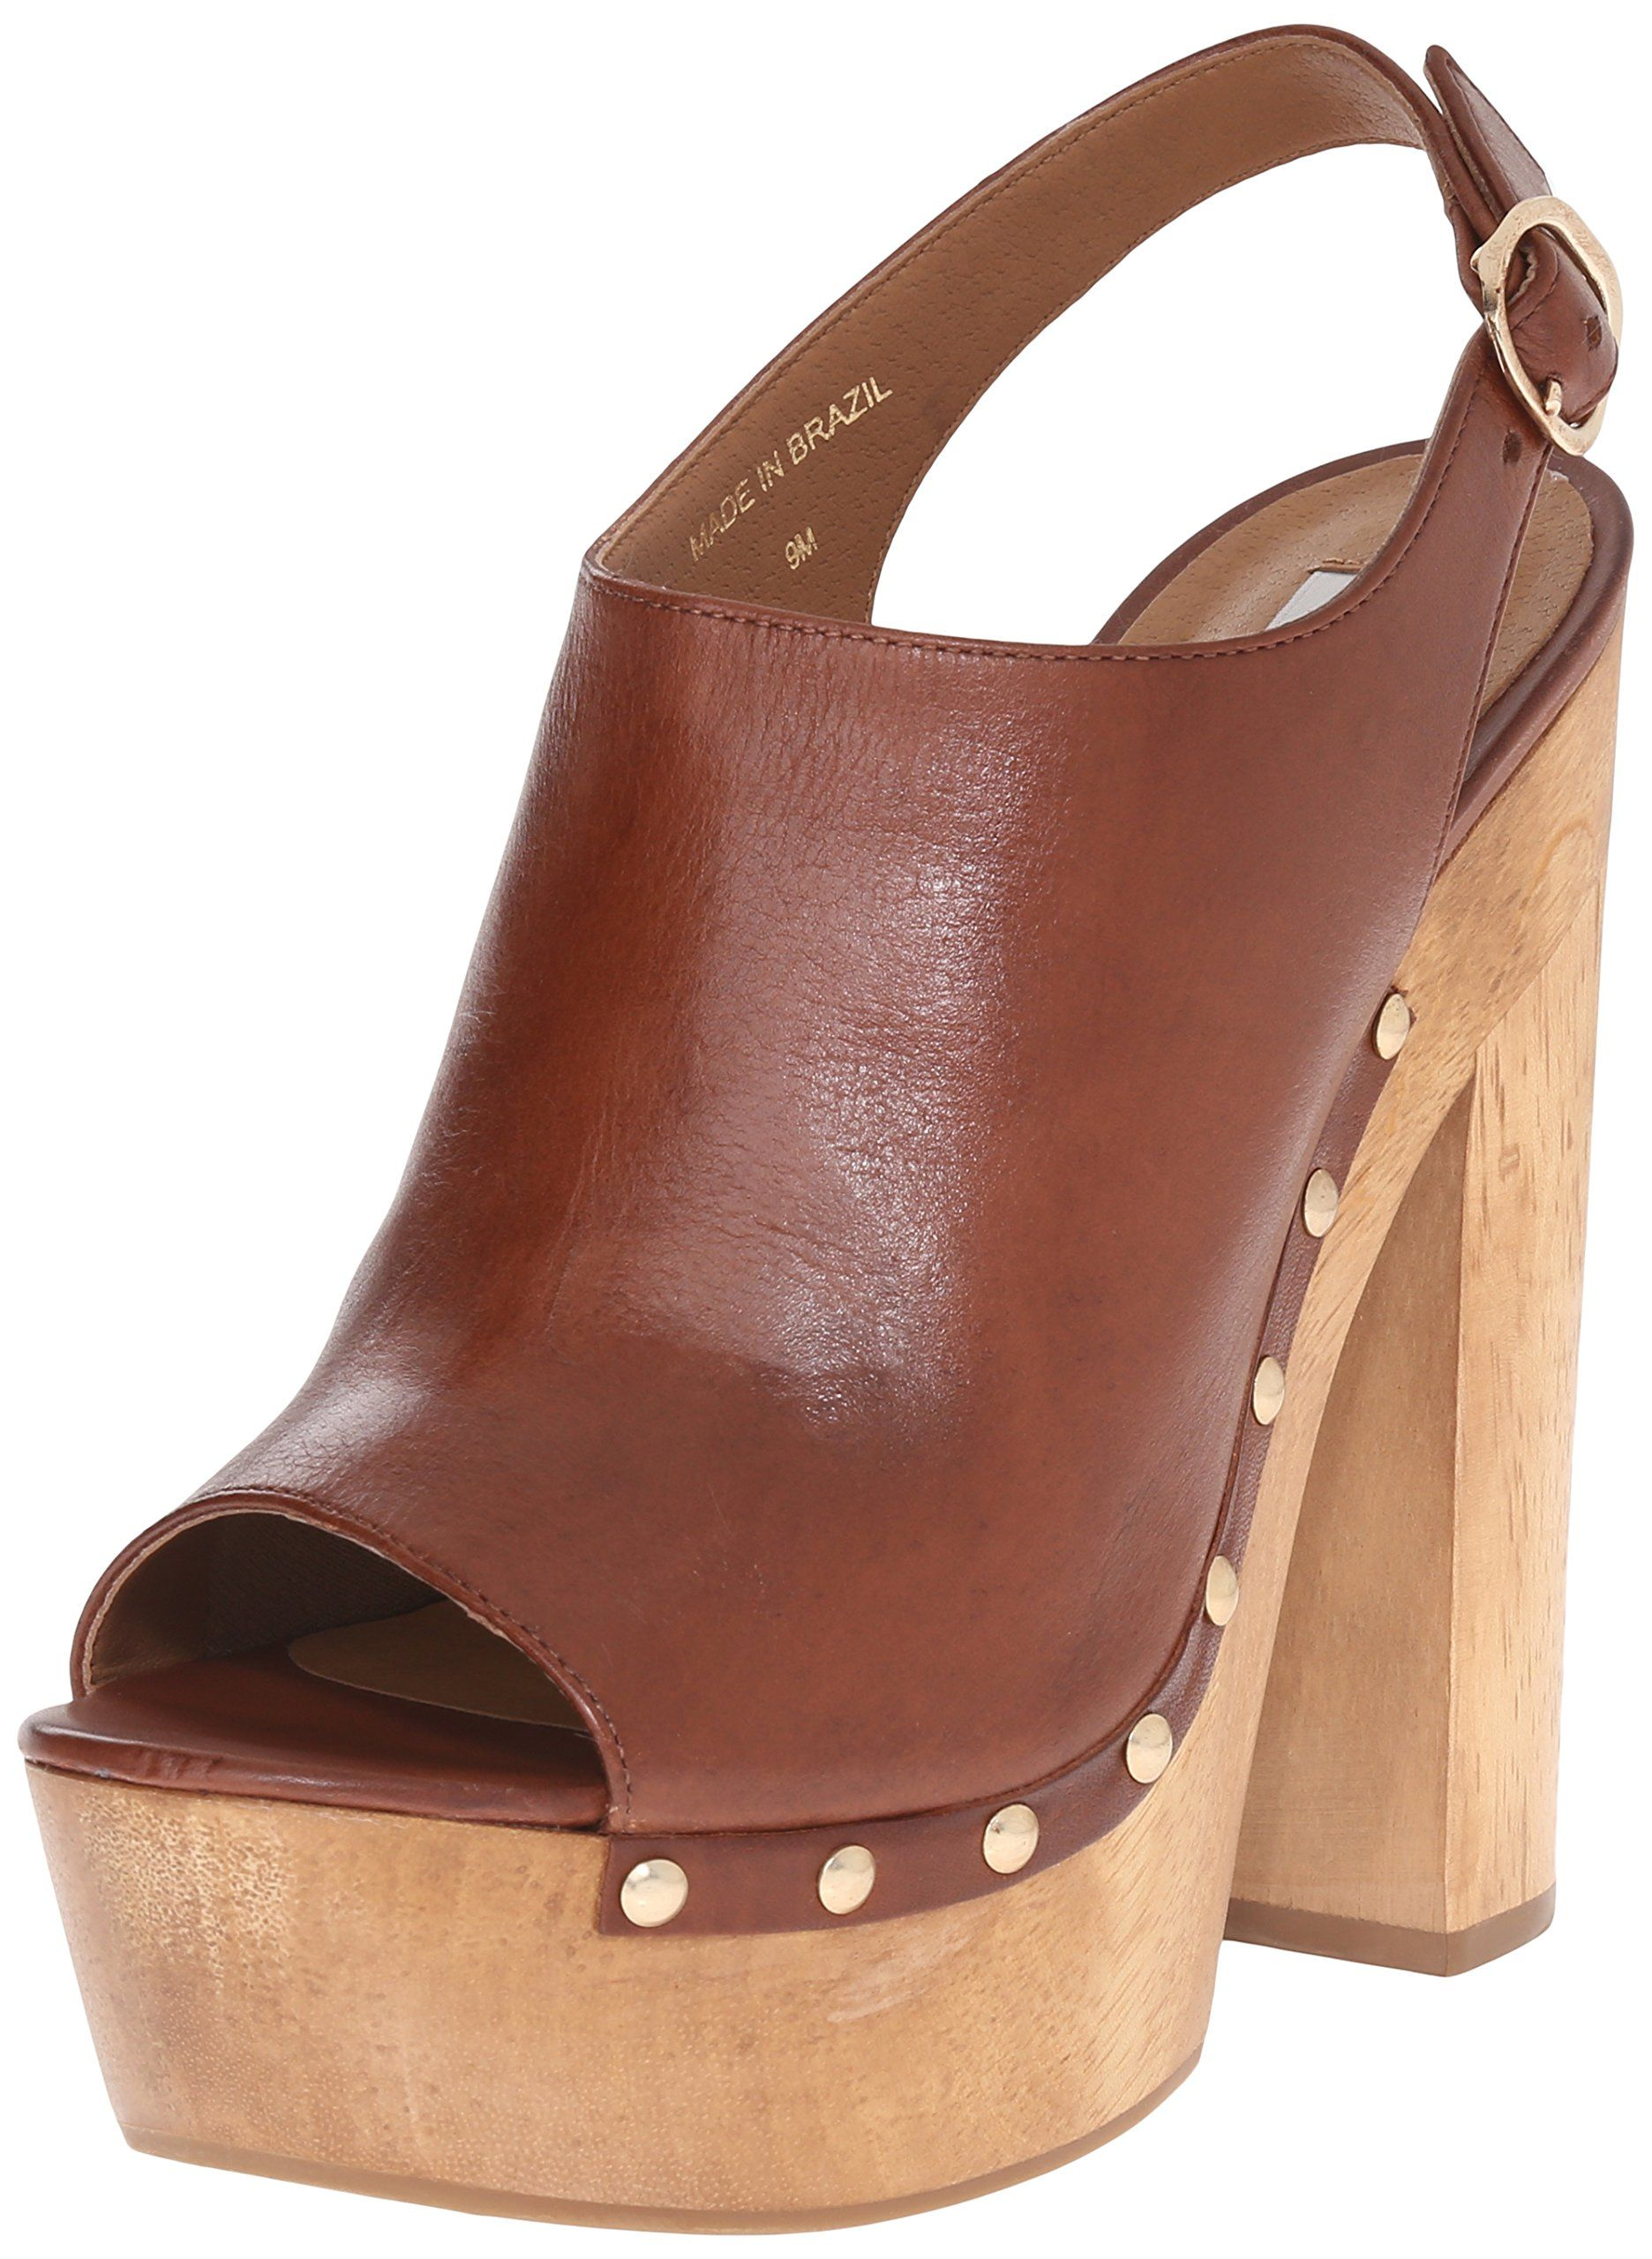 ec15417ece2 Steve Madden Women s Slngshut Peep-Toe Platform Heel